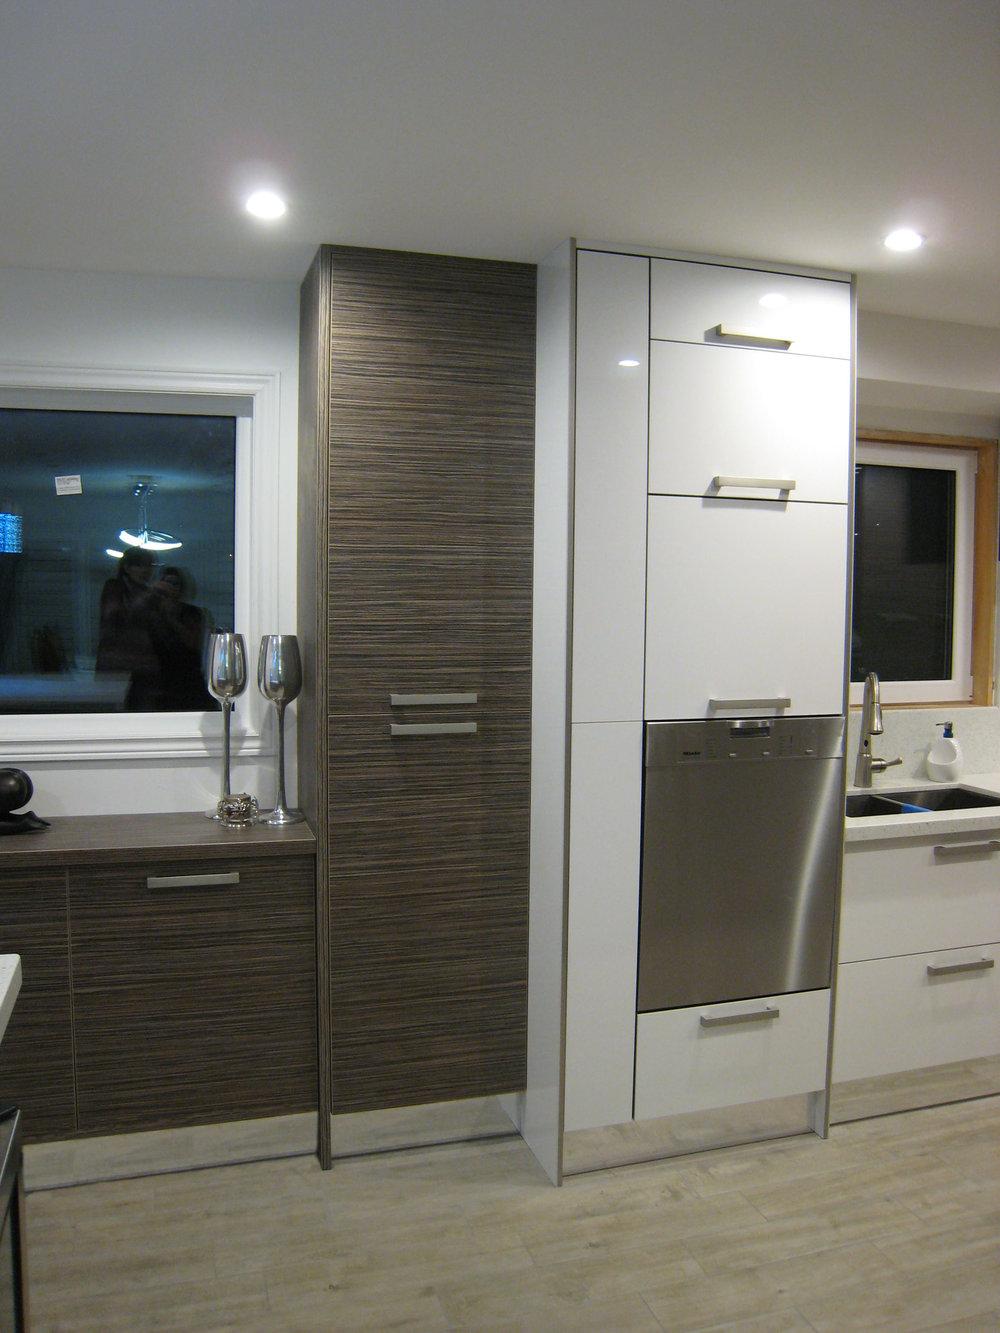 Kitchen 2 Pic 3.JPG